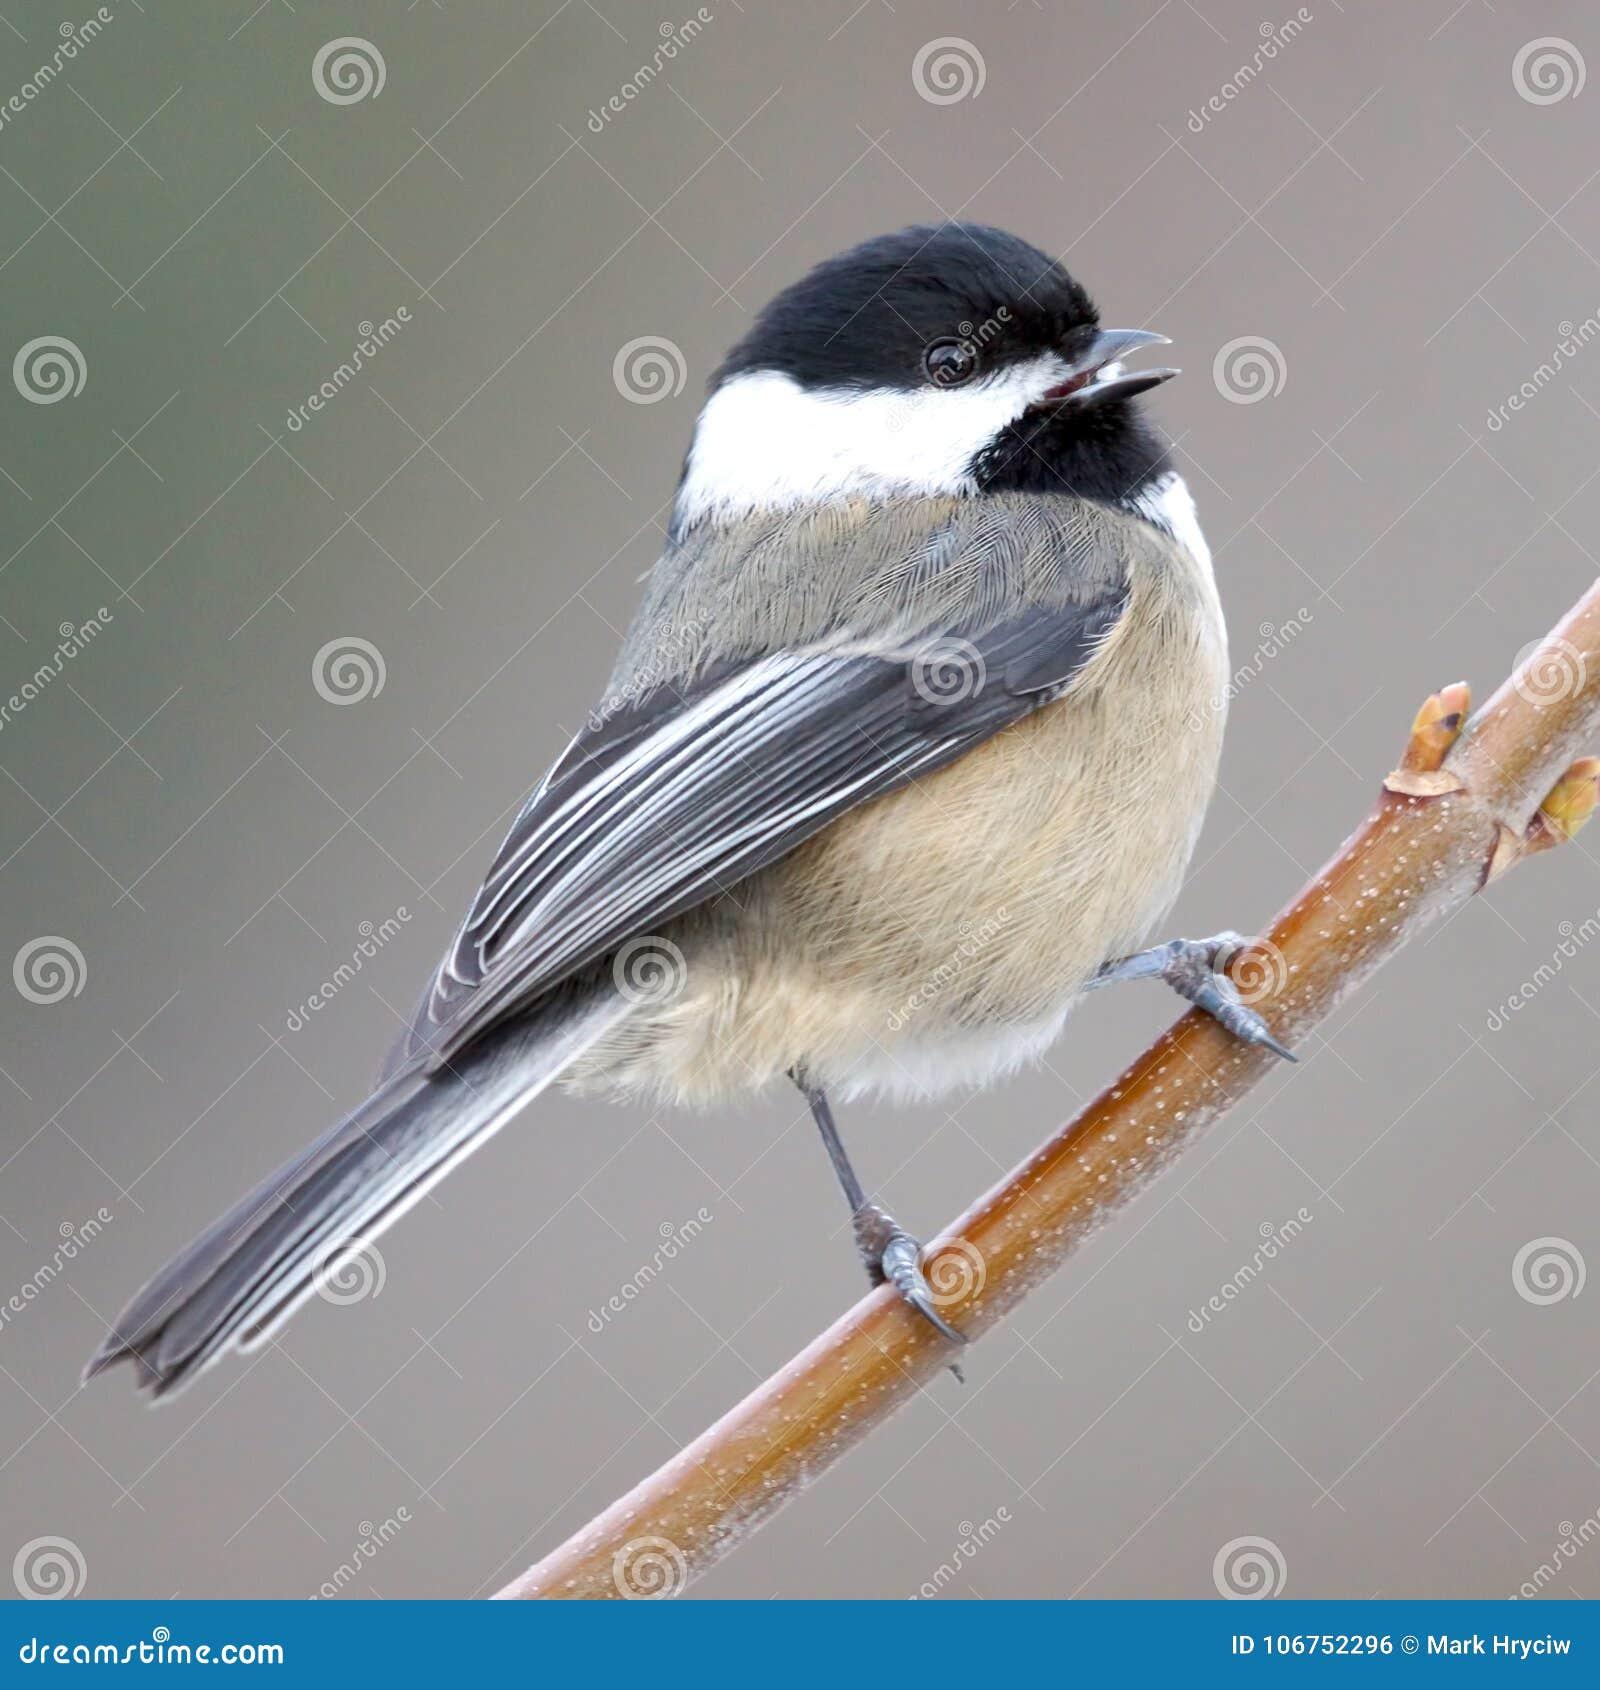 A Happy Friendly Small Cute Bird Called A Chickadee Stock